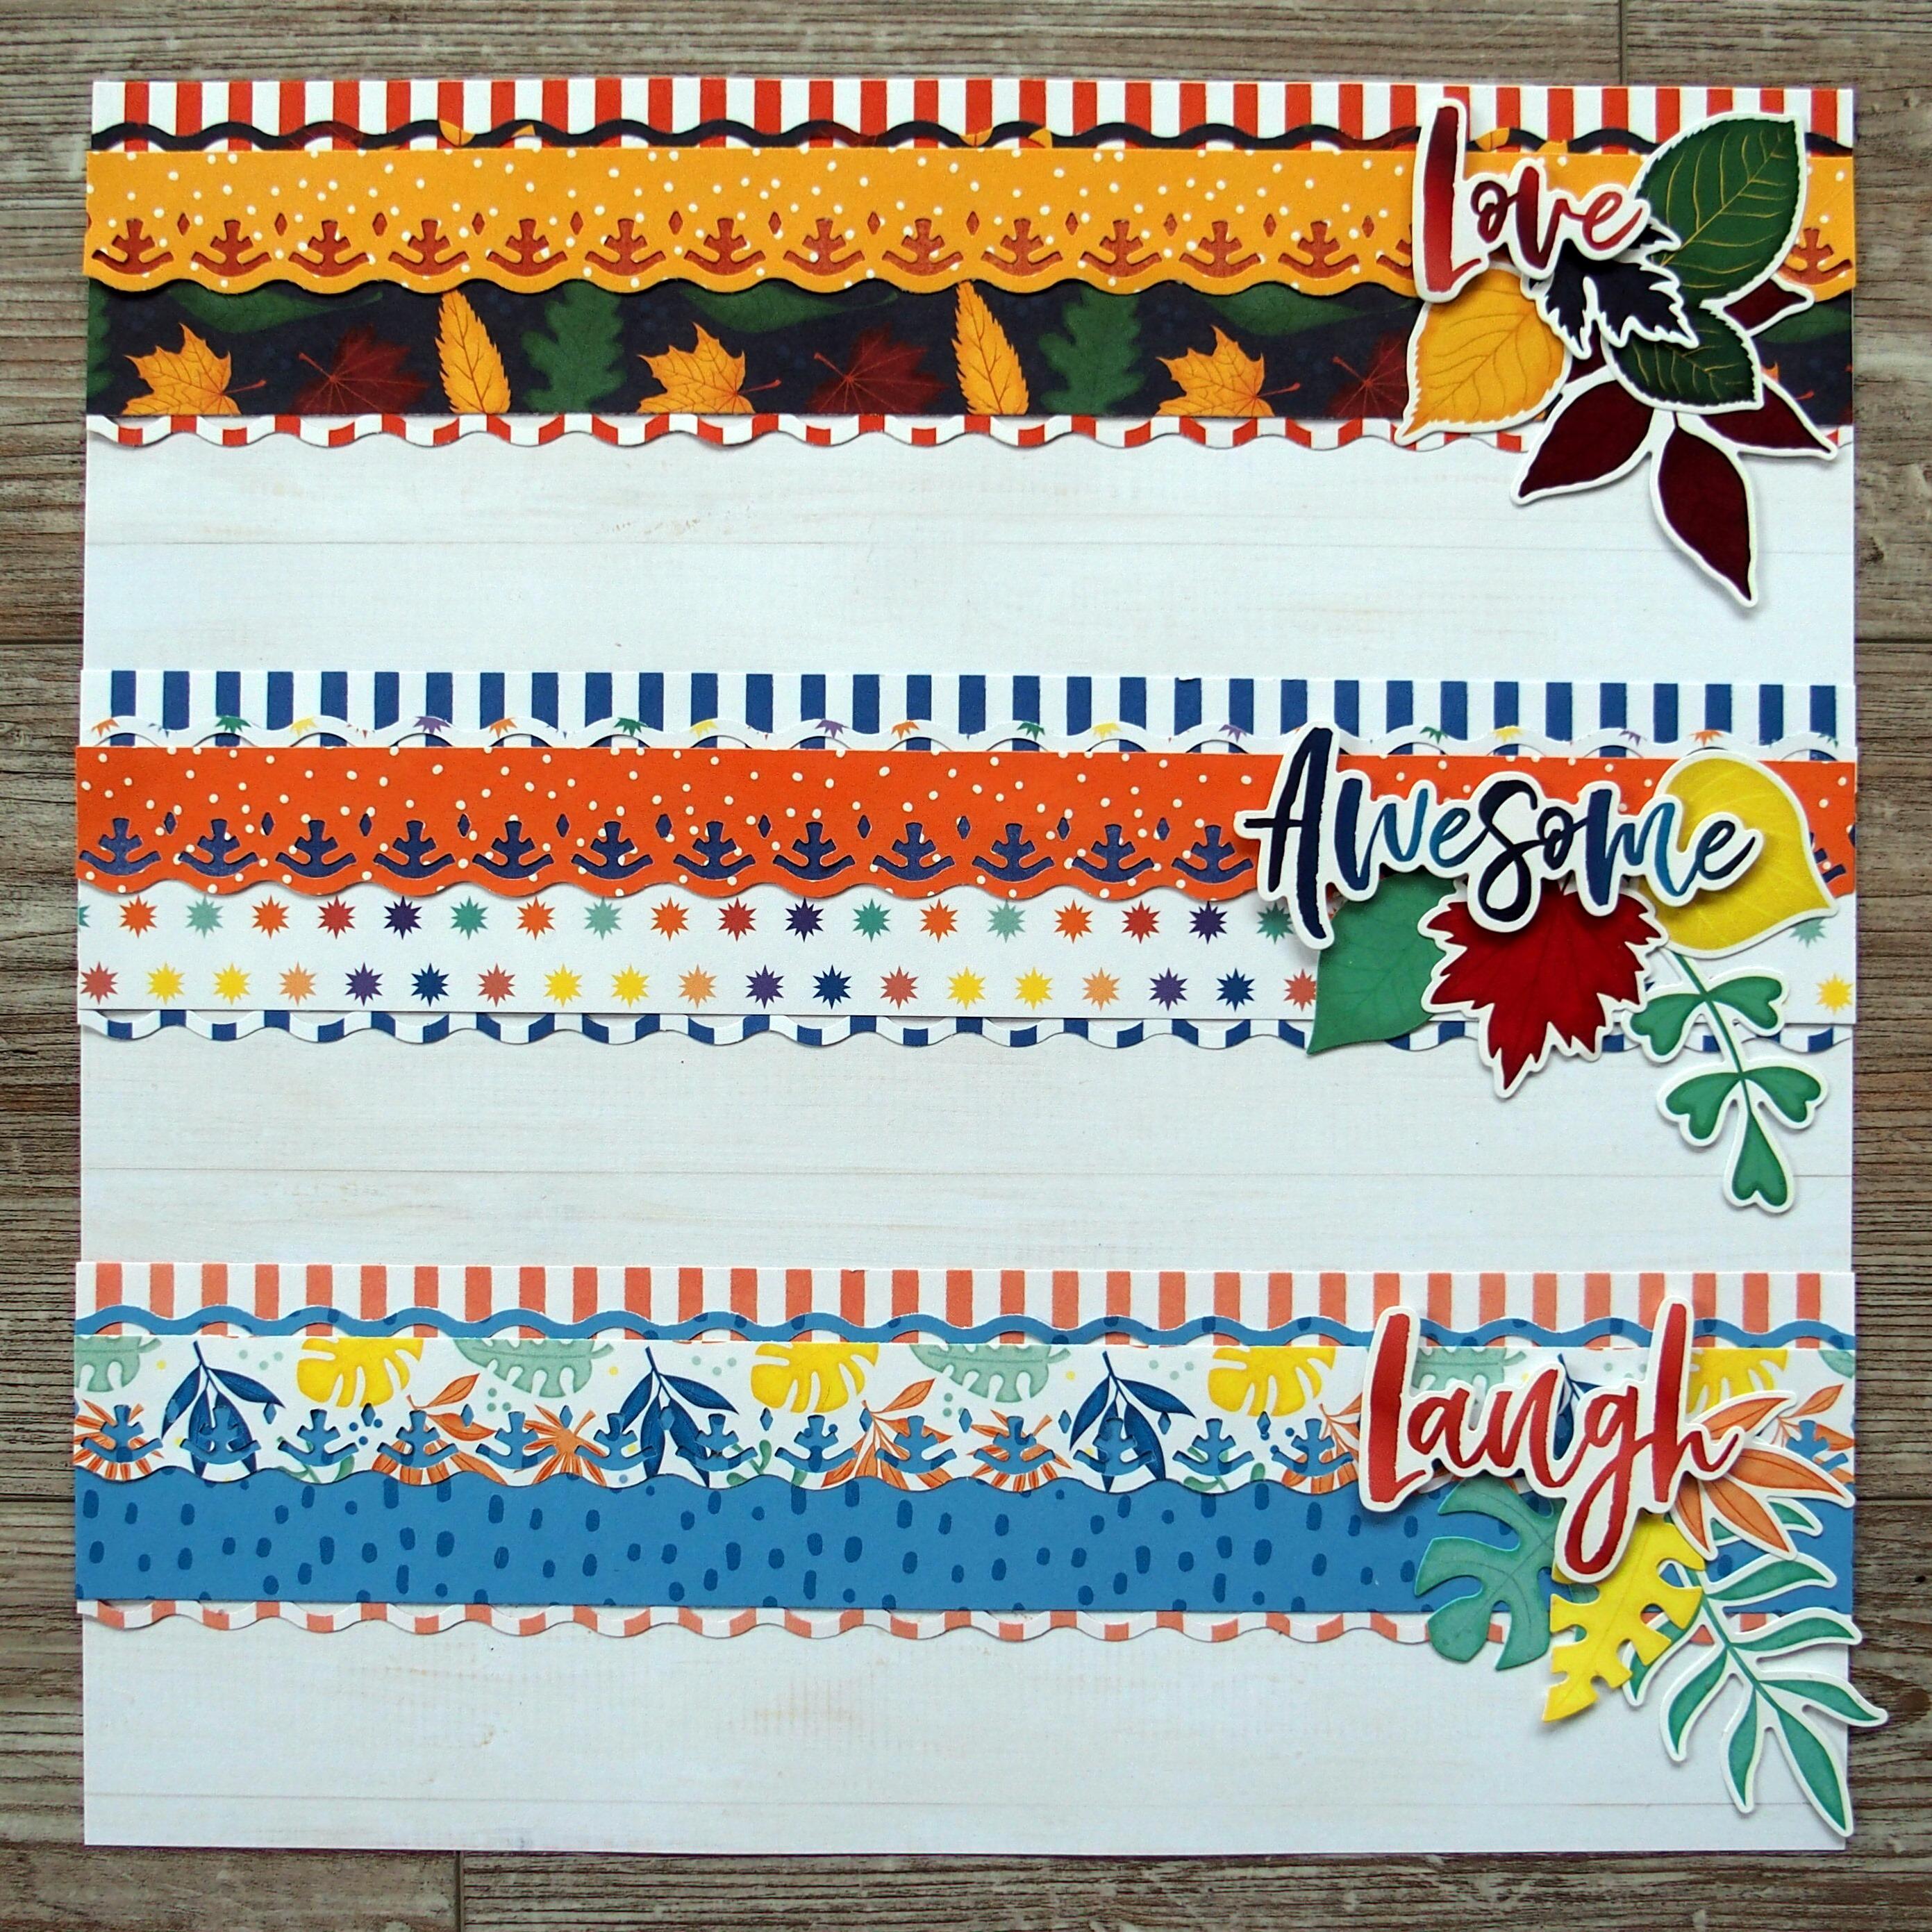 Rainbow-Rush-Collection-Scrapbooking-Borders-Creative-Memories-17